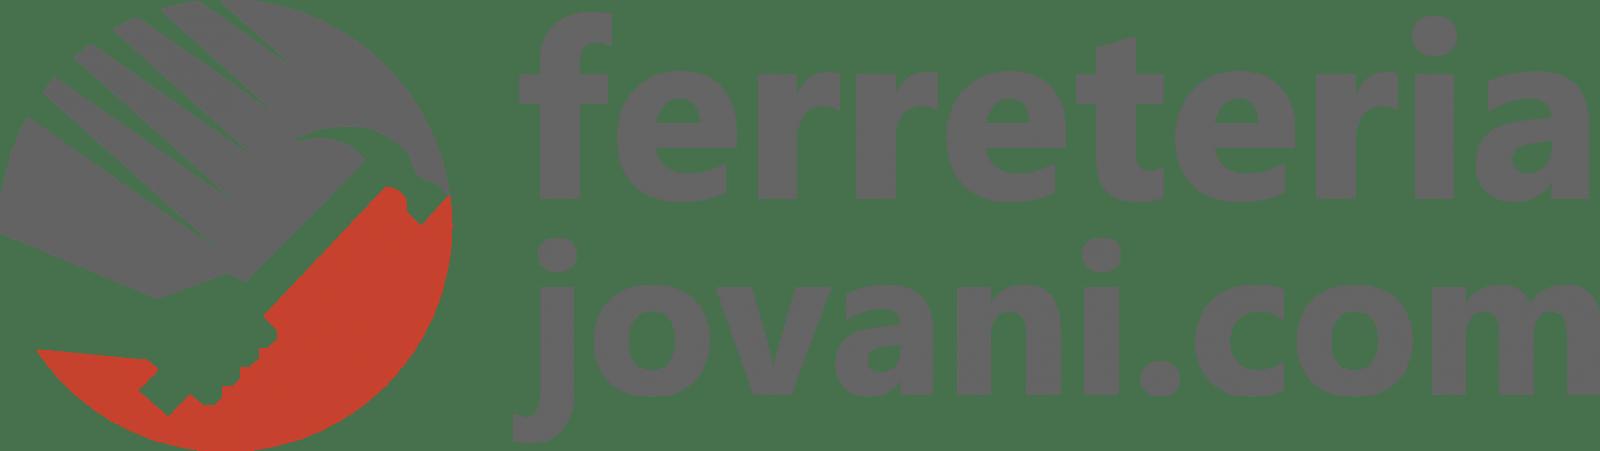 , ¿Qué NIVEL LÁSER comprar? | Comparativa NIVELES LÁSER AUTONIVELANTES, FERRETERÍA JOVANI, FERRETERÍA JOVANI